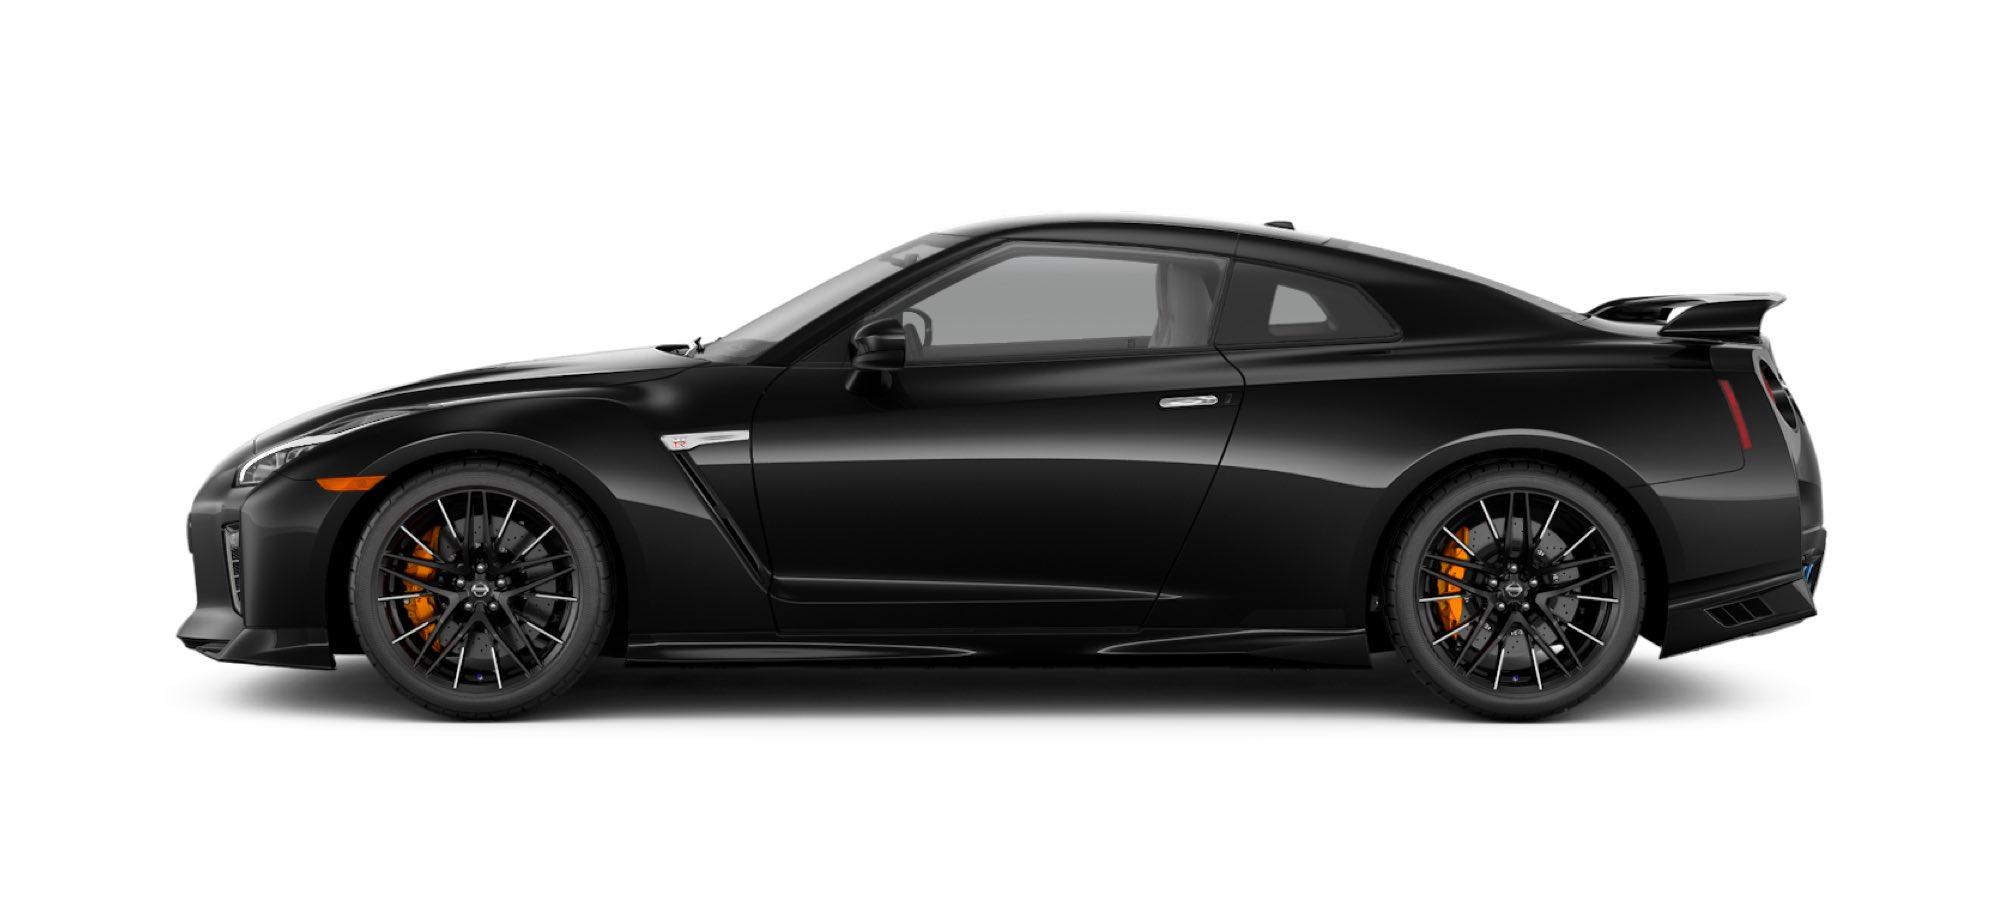 2021 Nissan GT-R in Jet Black Pearl